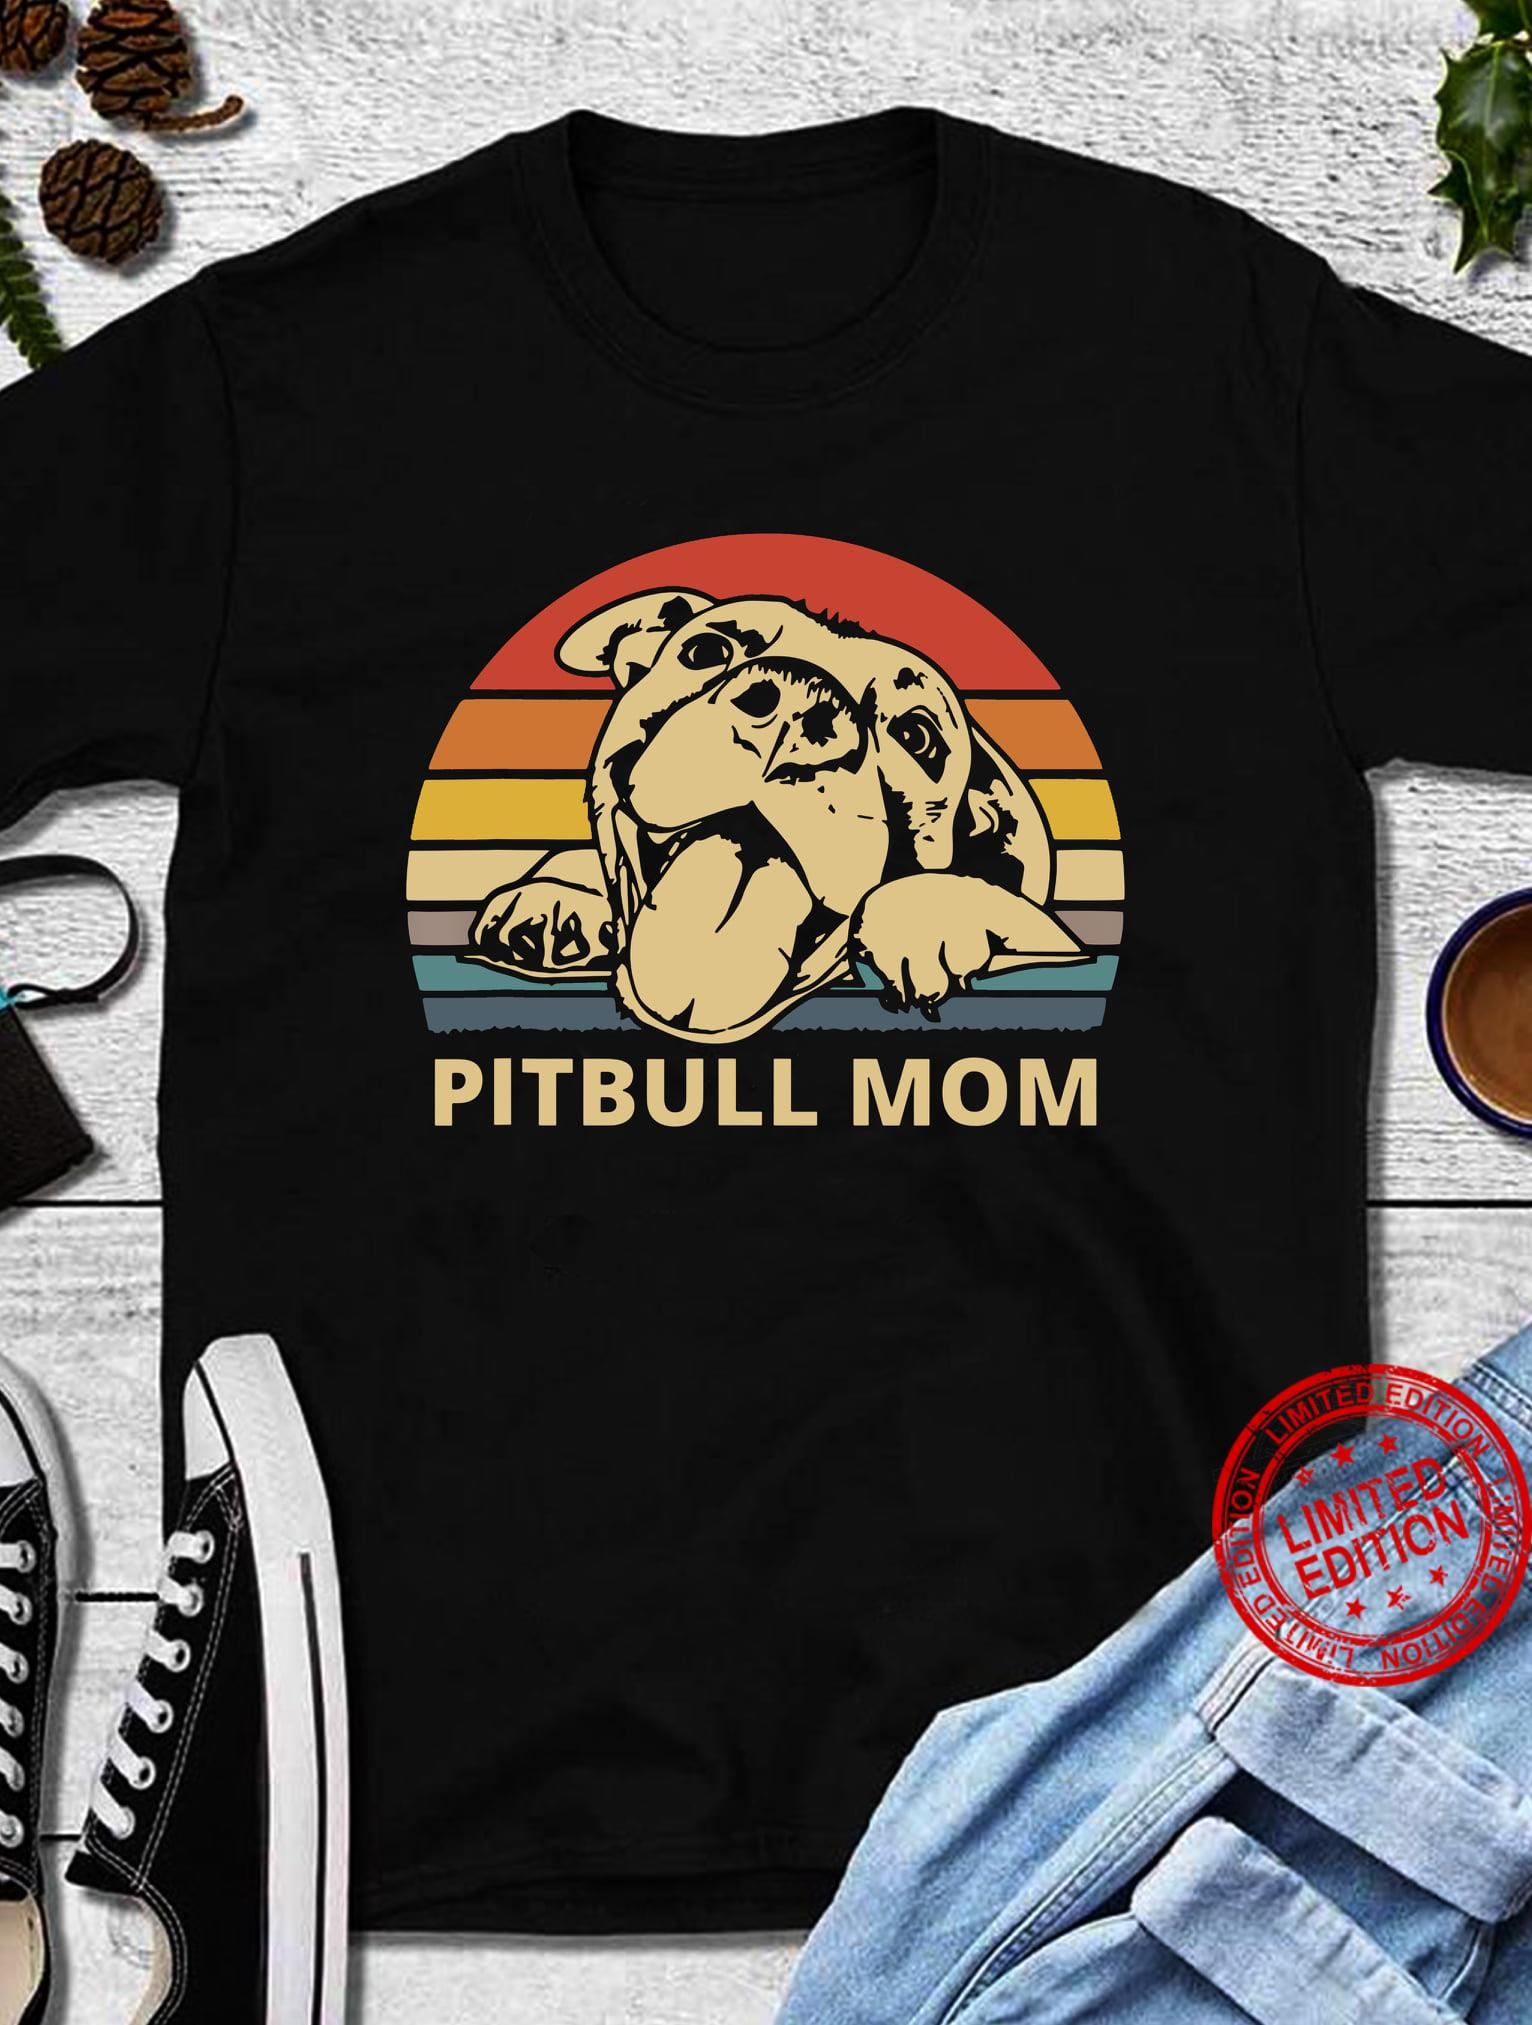 Pitbull Mom Shirt